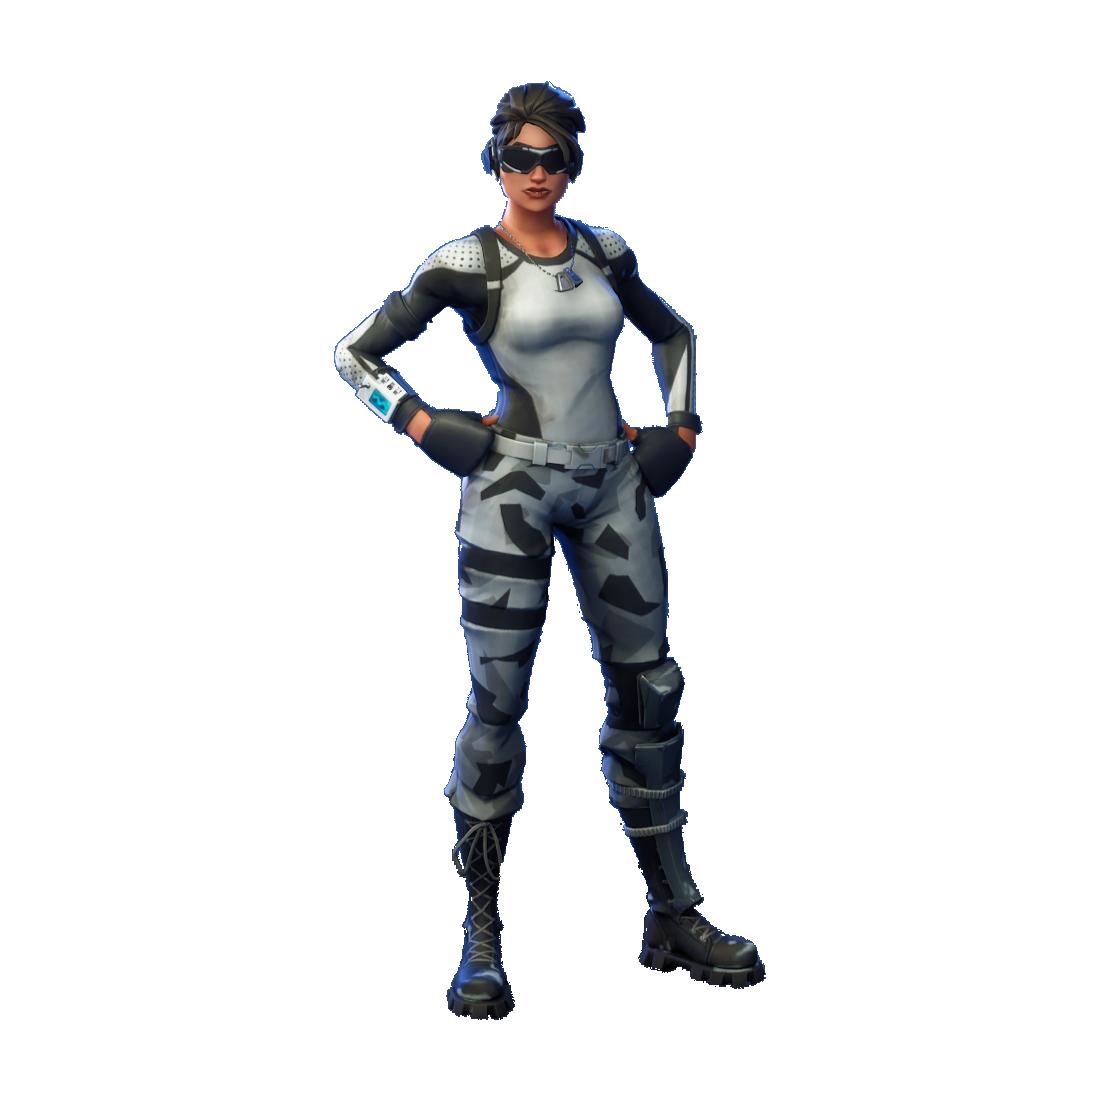 Arctic Assassin - Полярный ассасин (Arctic Assassin)